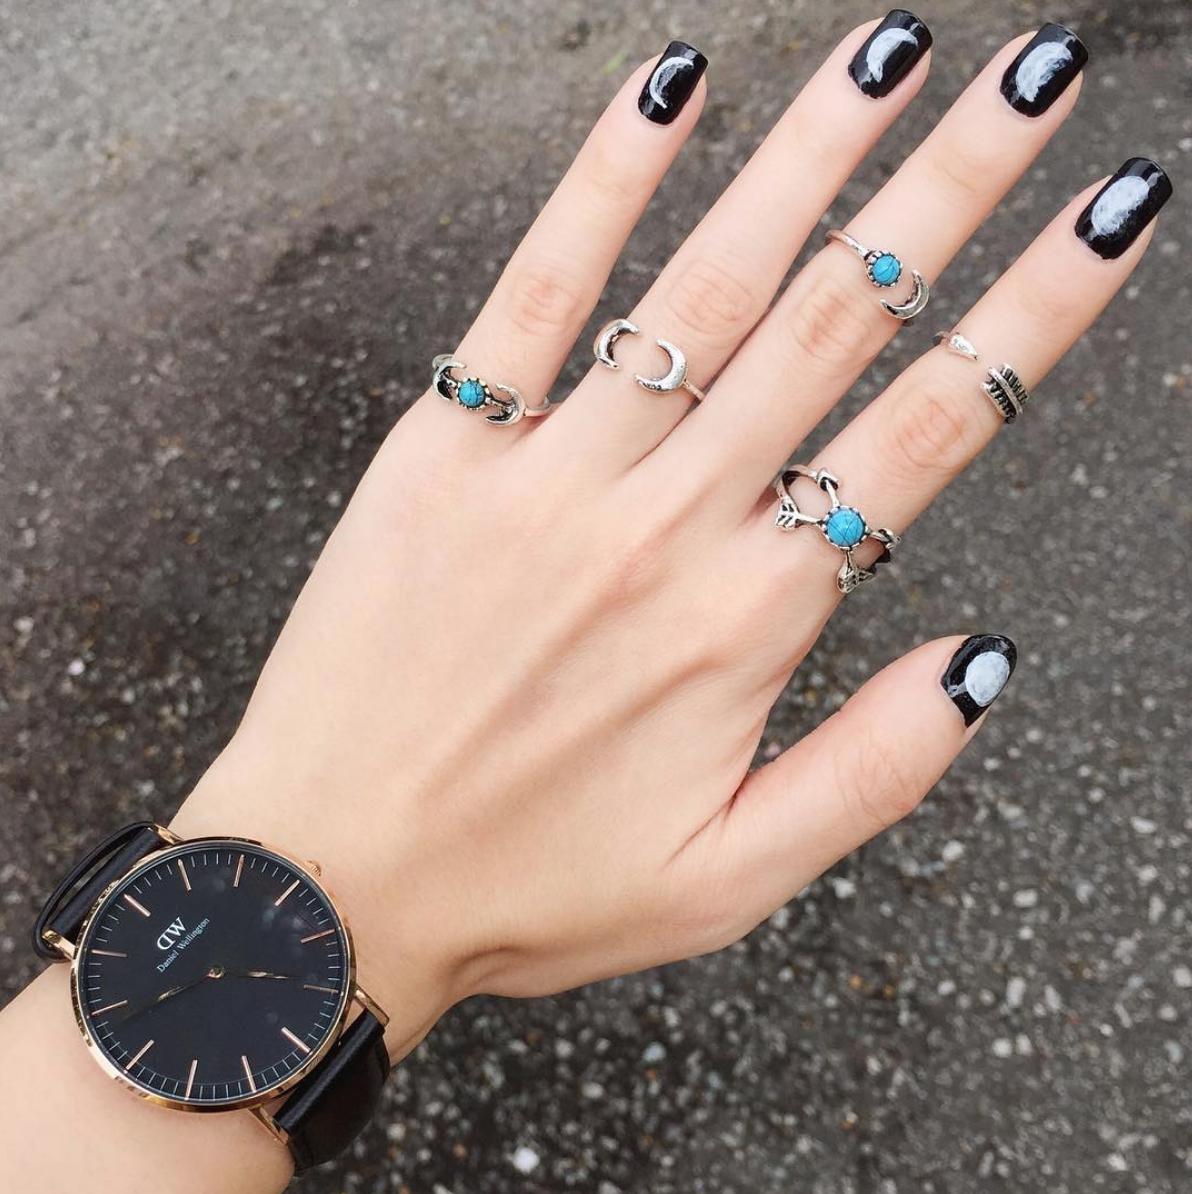 Boho Moon & Arrow Ring Set (Silver/Turquoise) from Megoosta Fashion